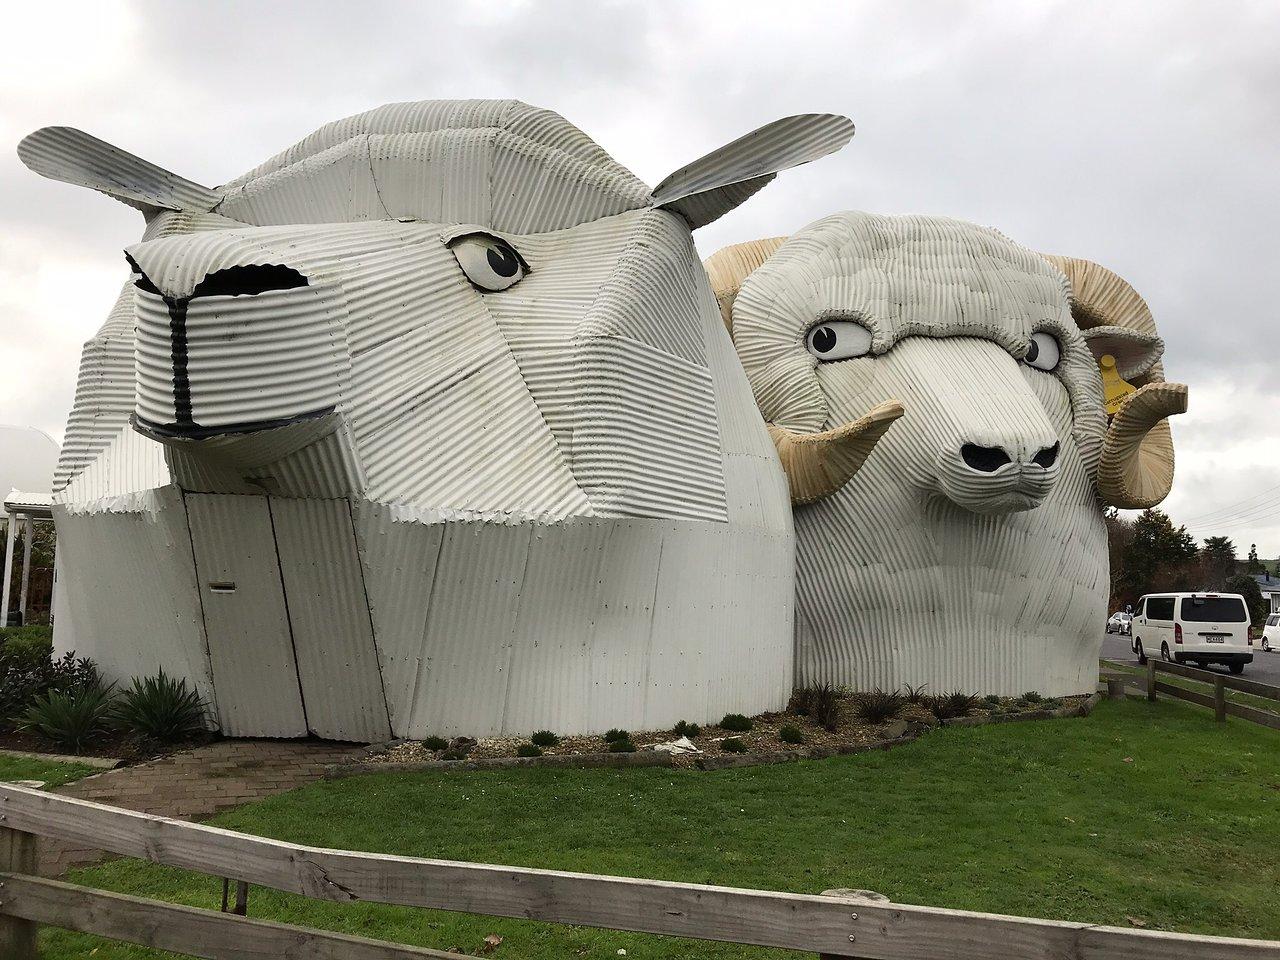 Dog and Sheep Shaped Corrugated Metal Buildings (Tirau), New Zealand @Tripadvisor